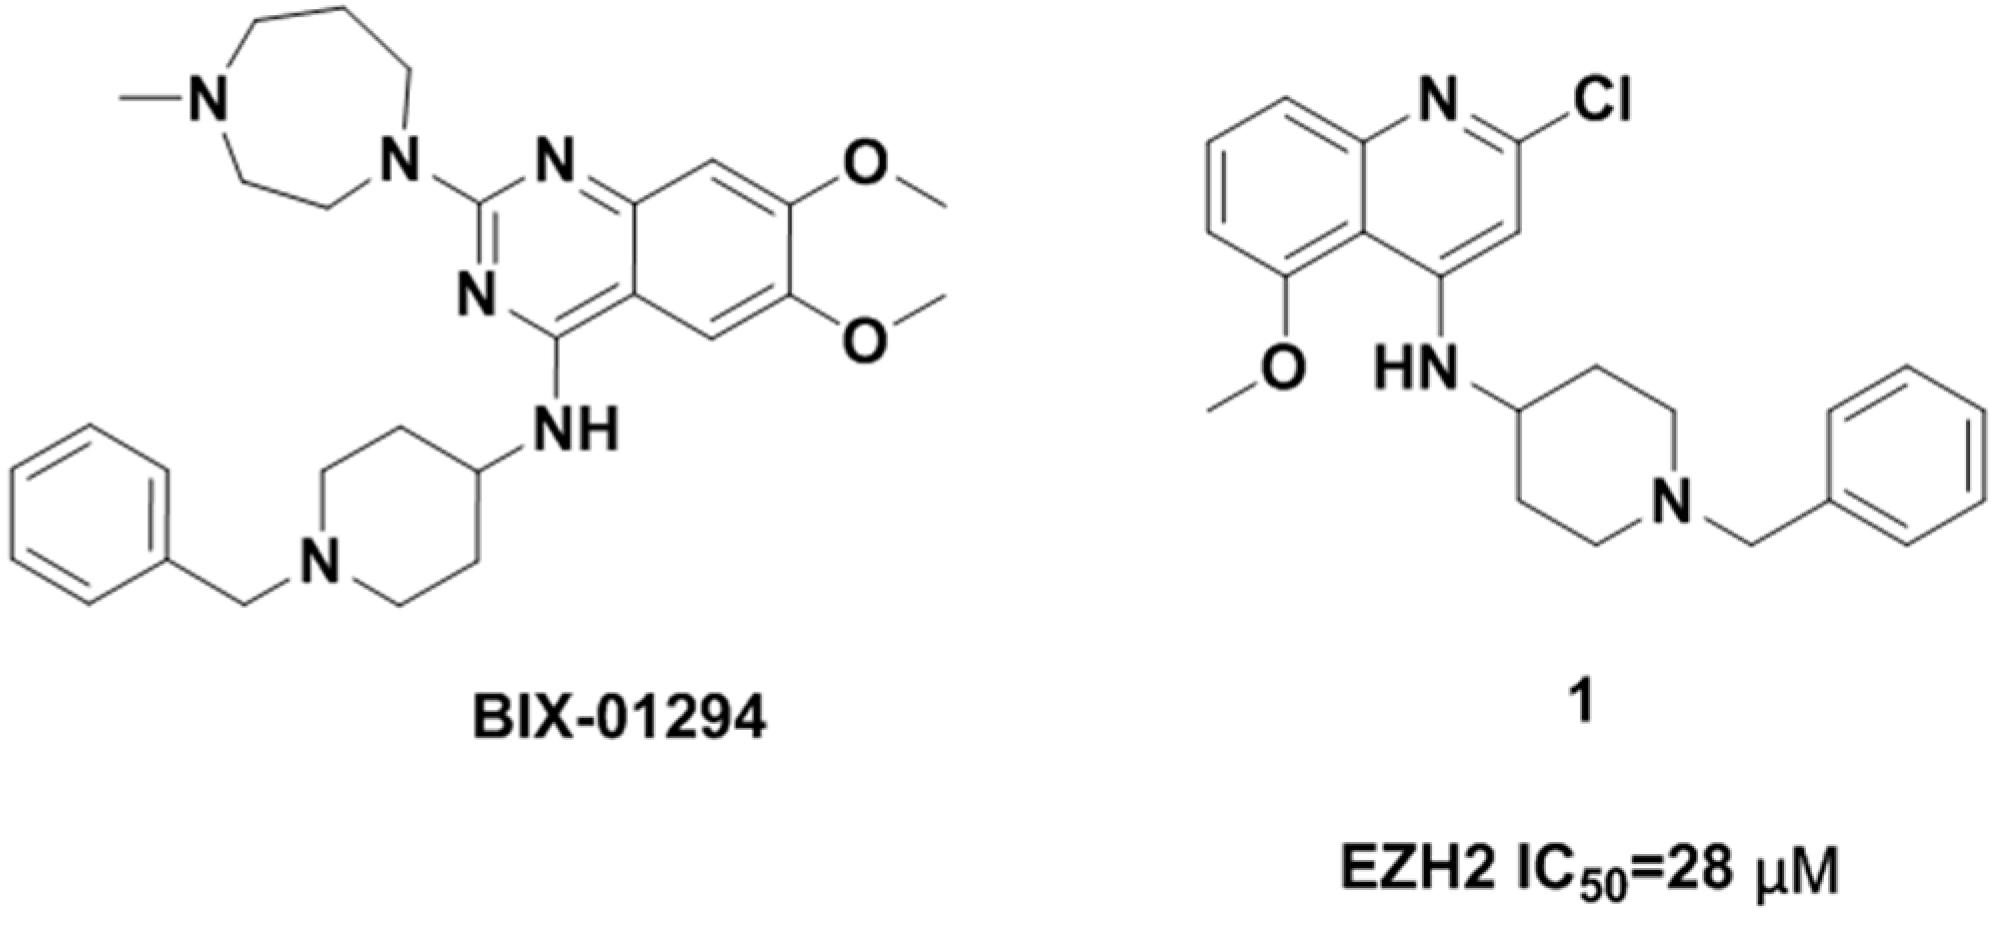 Molecules Free Full Text 5 Methoxyquinoline Derivatives As A New Bix Block Diagram 20 07620 G002